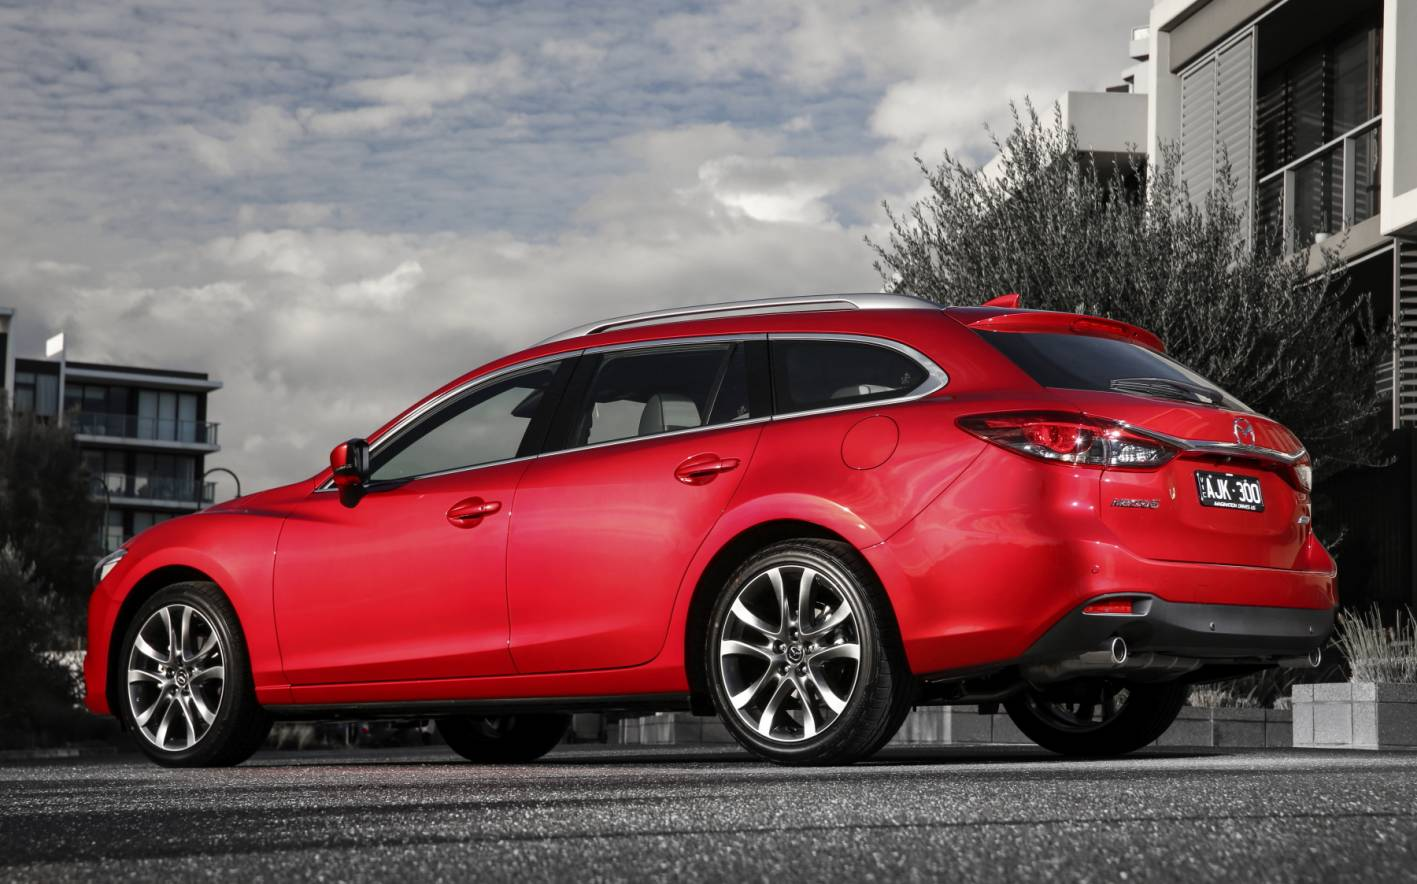 Hyundai Santa Fe 2017 >> 2017 Mazda6 gains improved safety and refinement - ForceGT.com